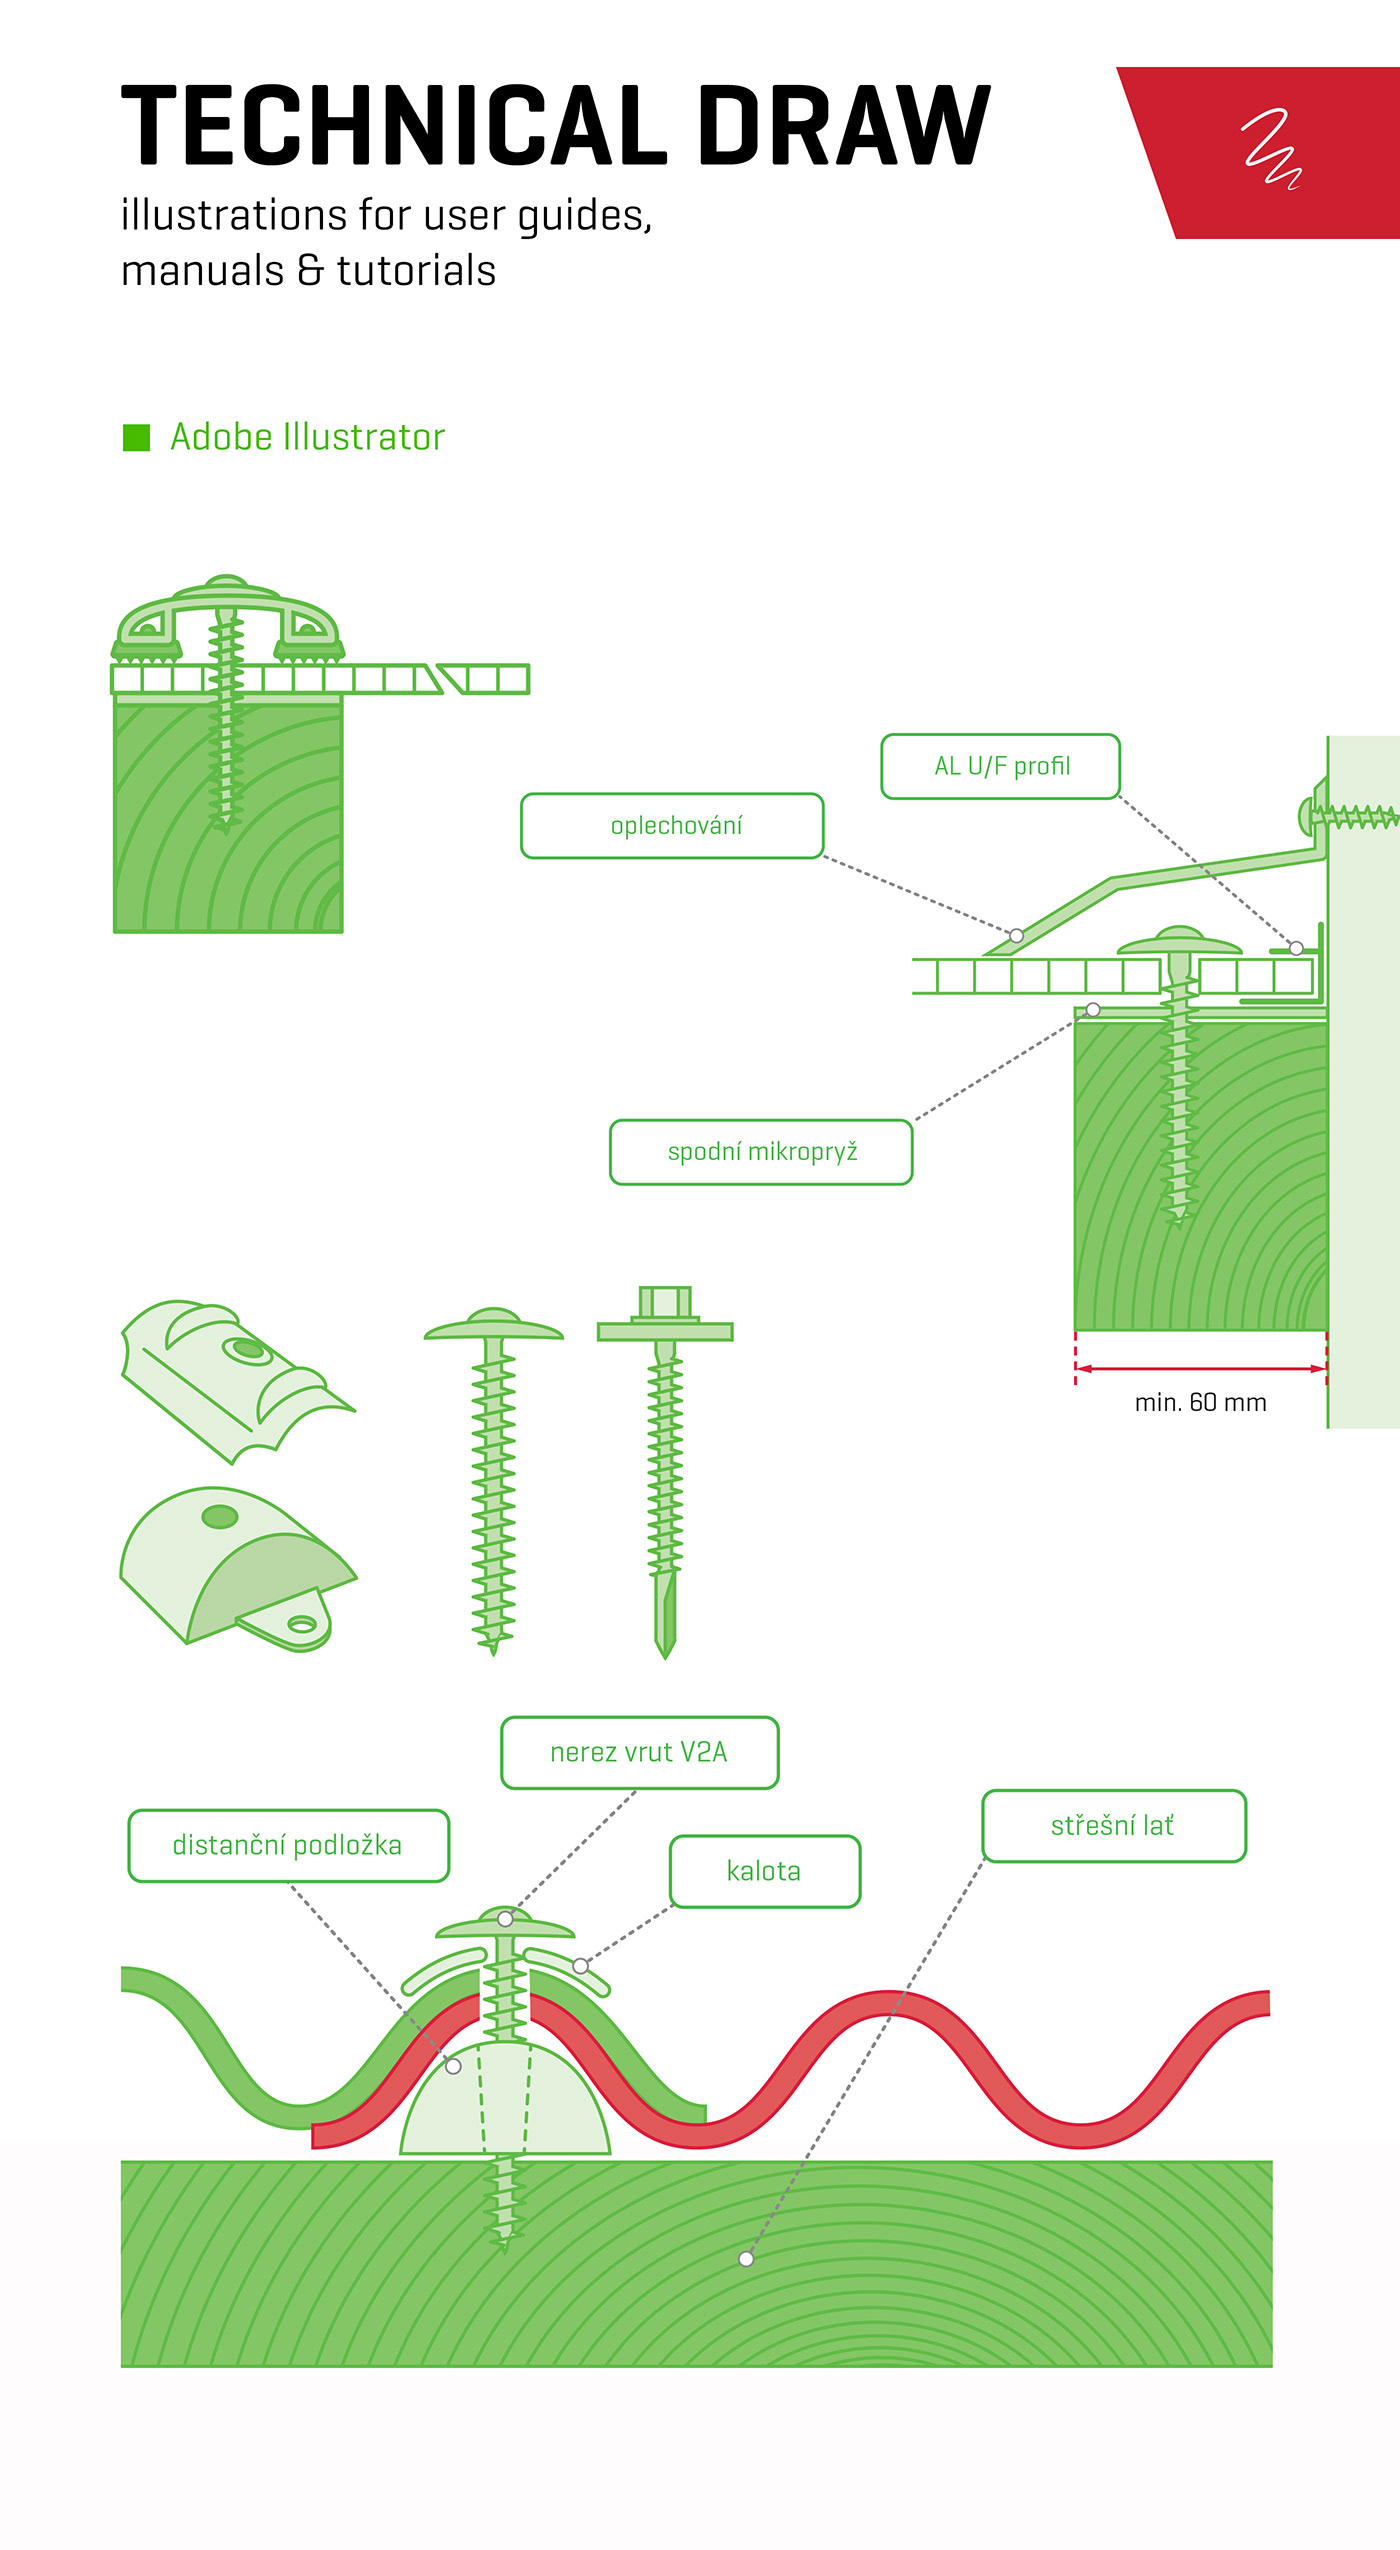 Webdesign illustrations animations videos html5